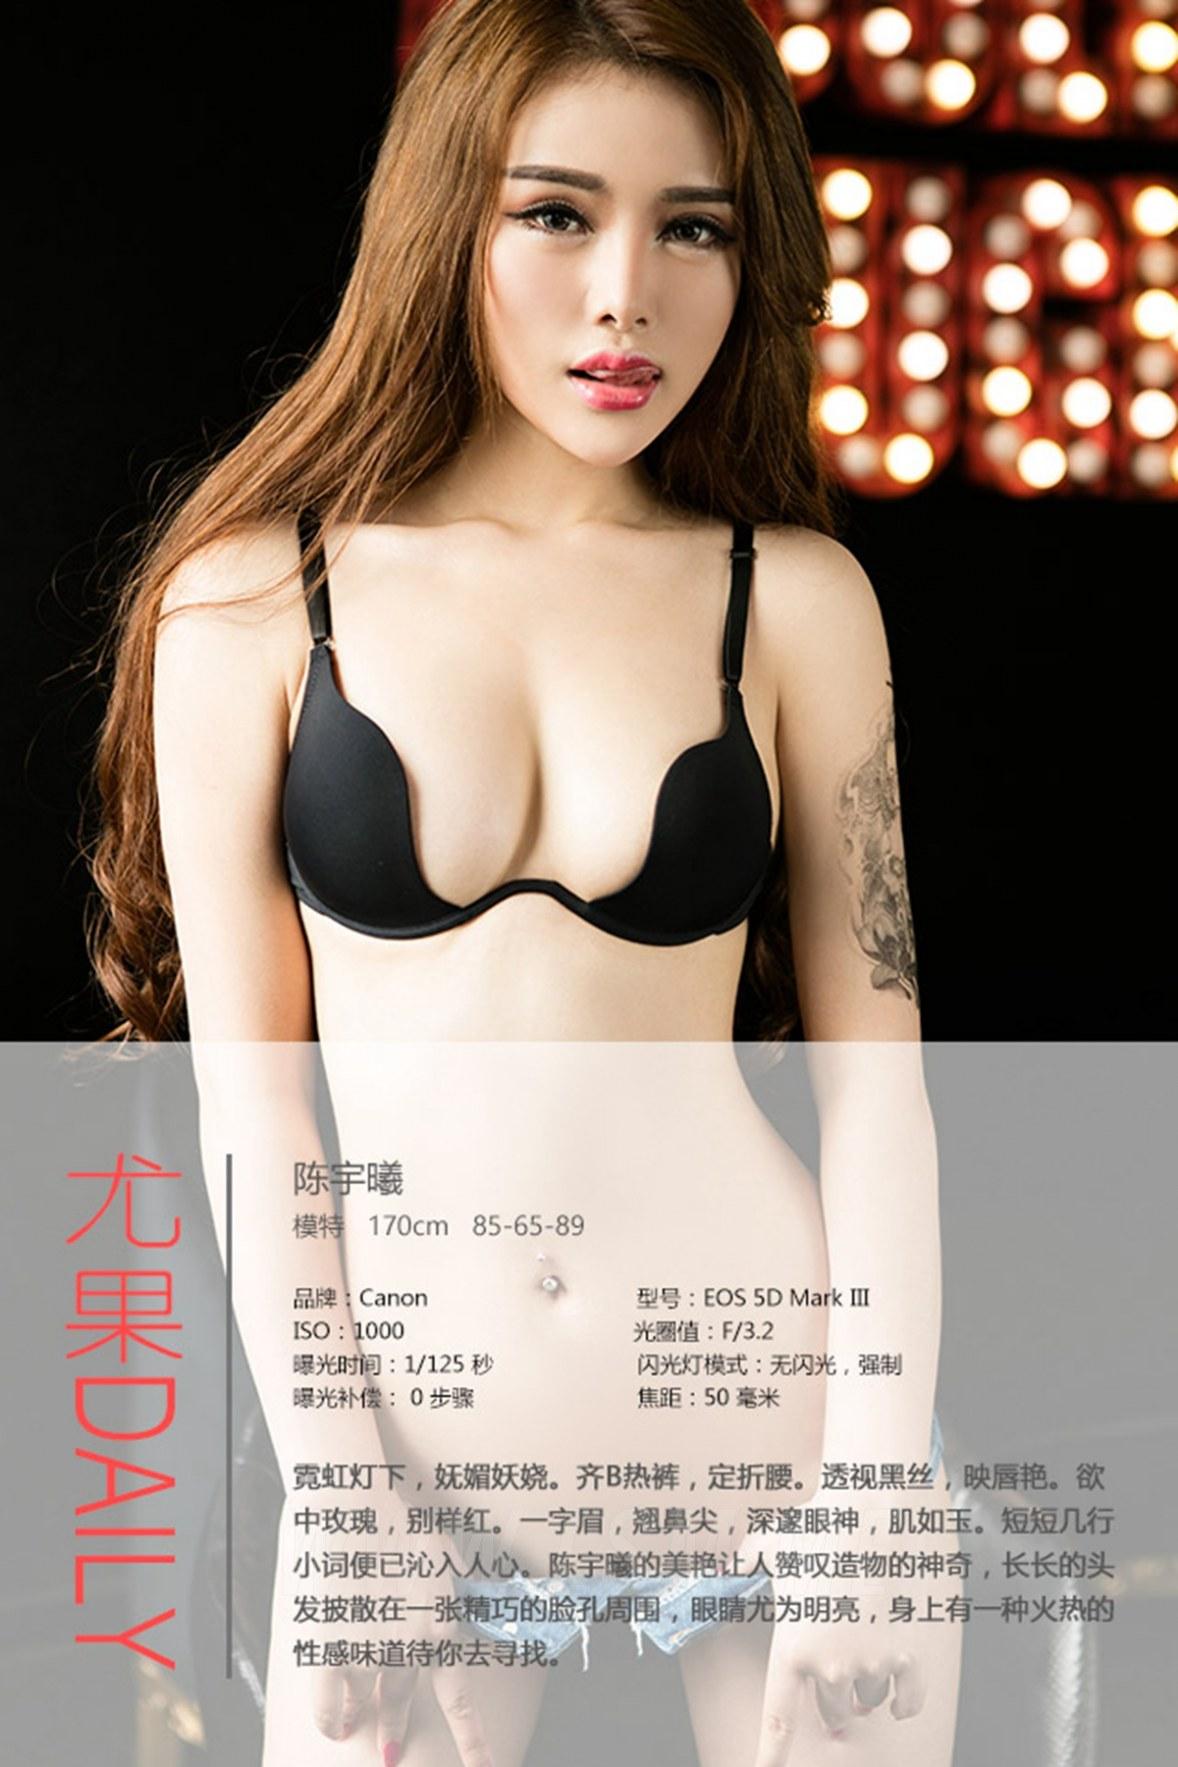 UGirls 爱尤物 No.389 Modo 陈宇曦 - 4